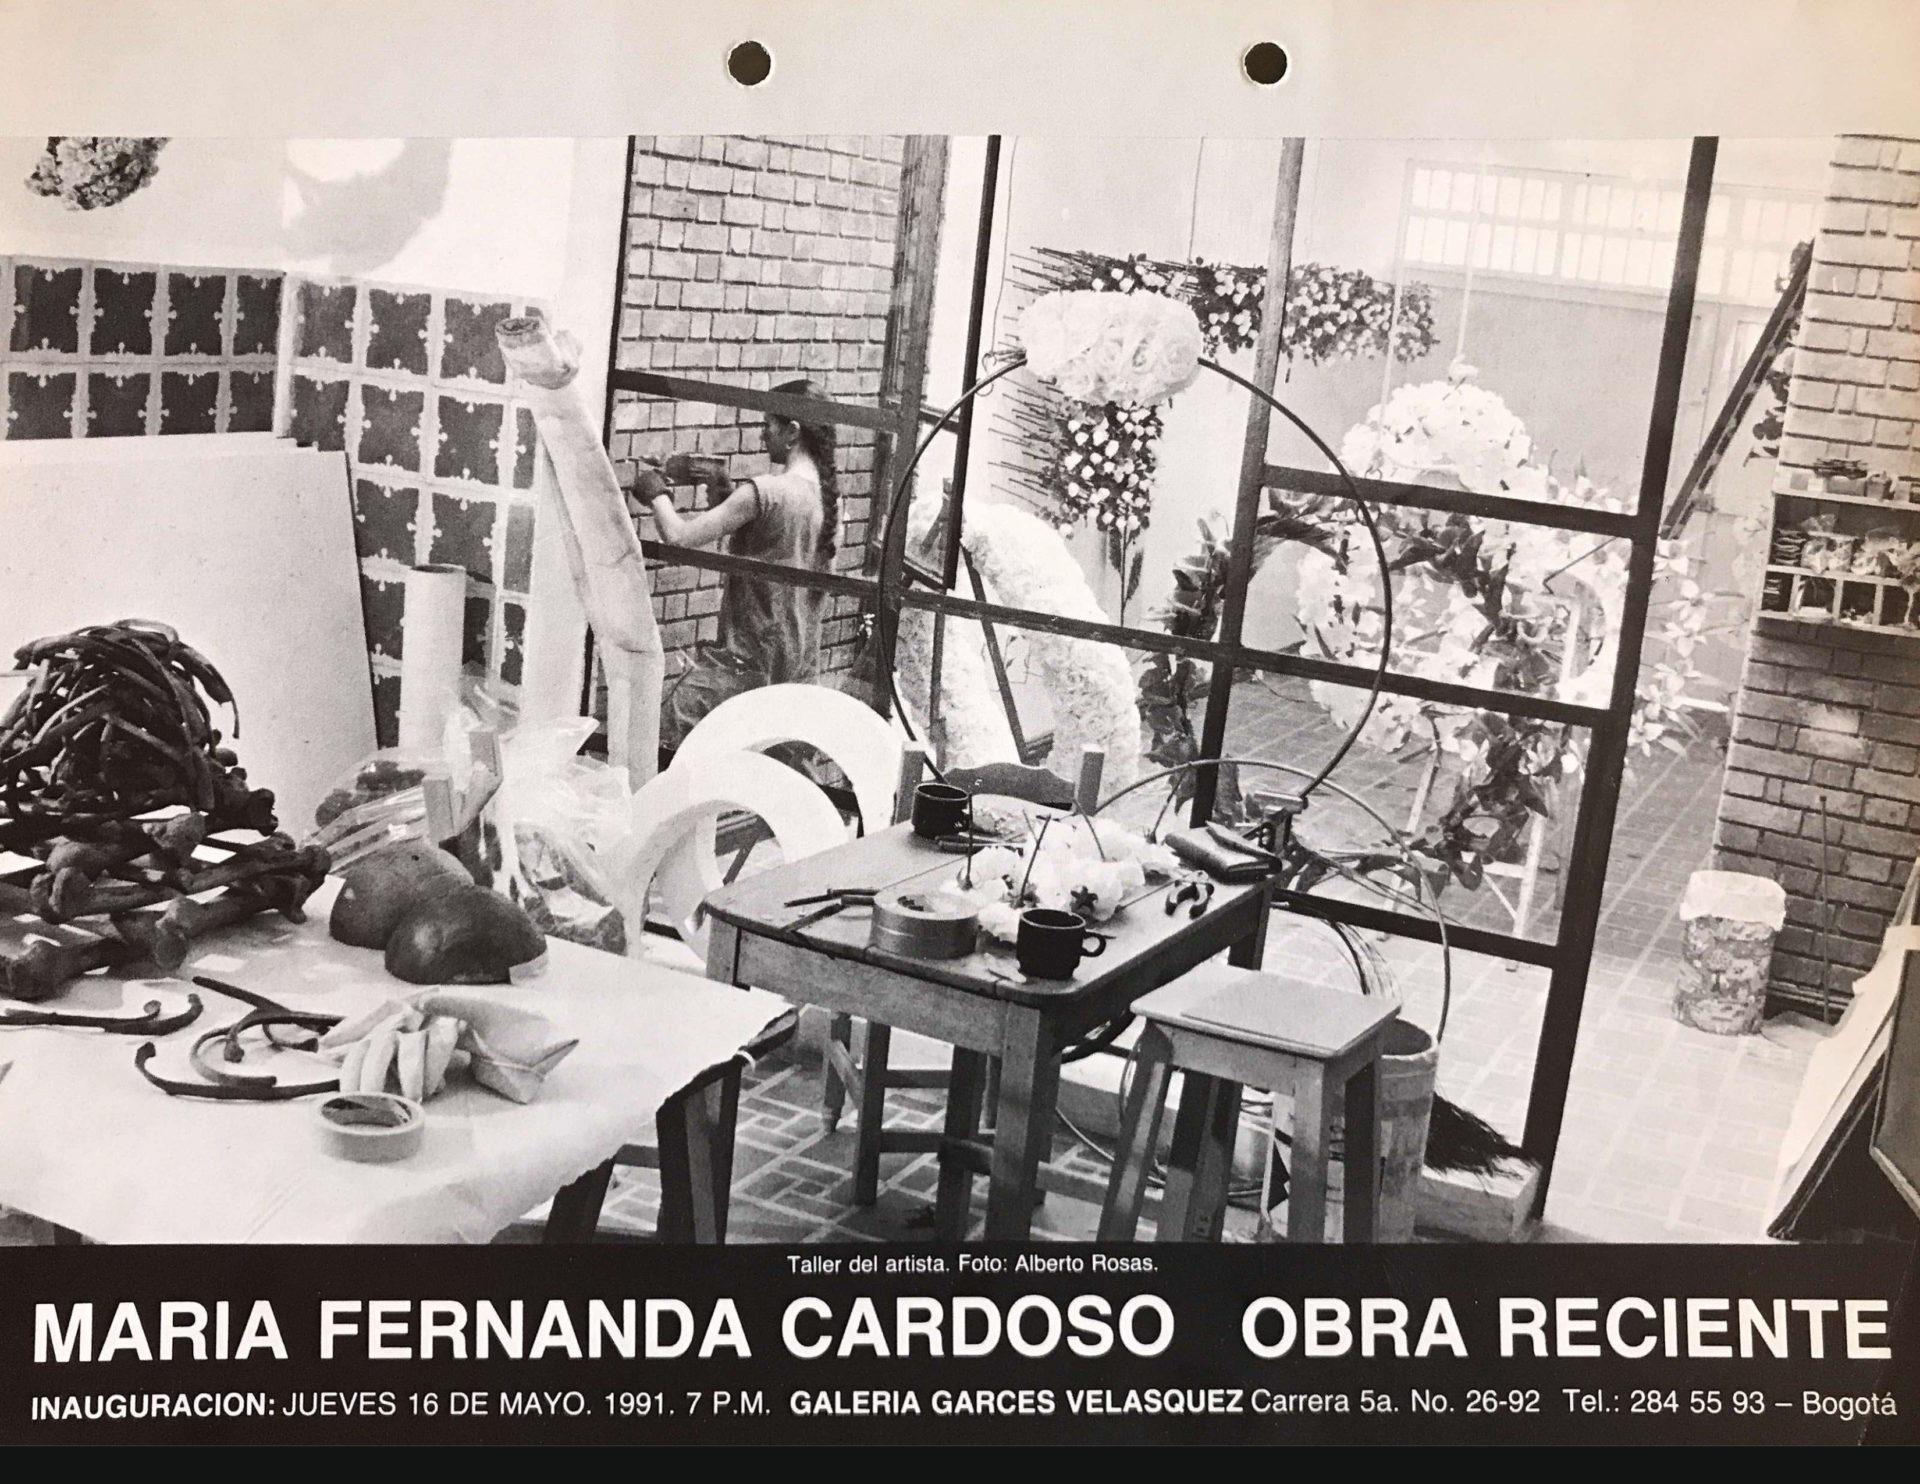 Recent Work. Galería Garcés y Velásquez, Bogotá, Colomb